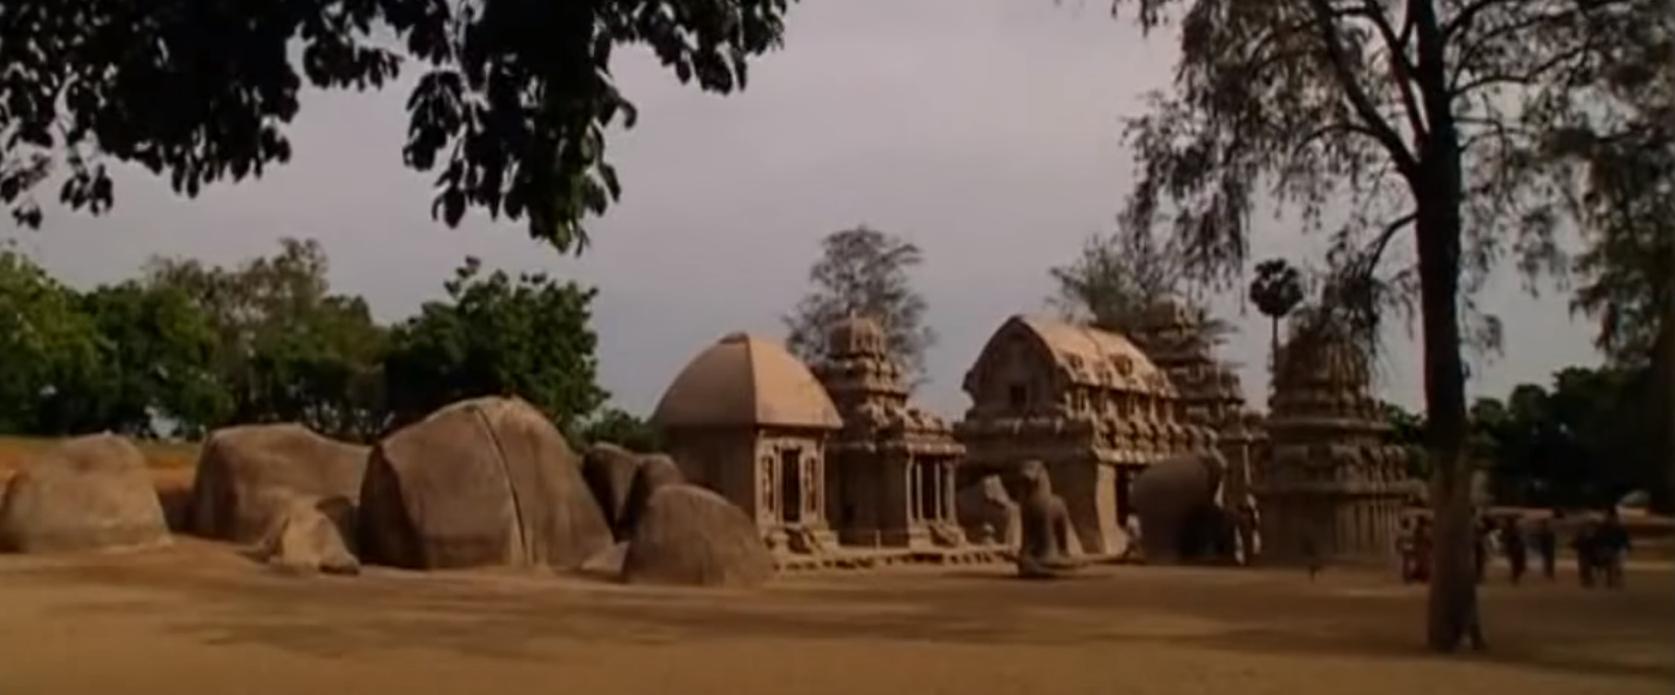 Индуистская архитектура